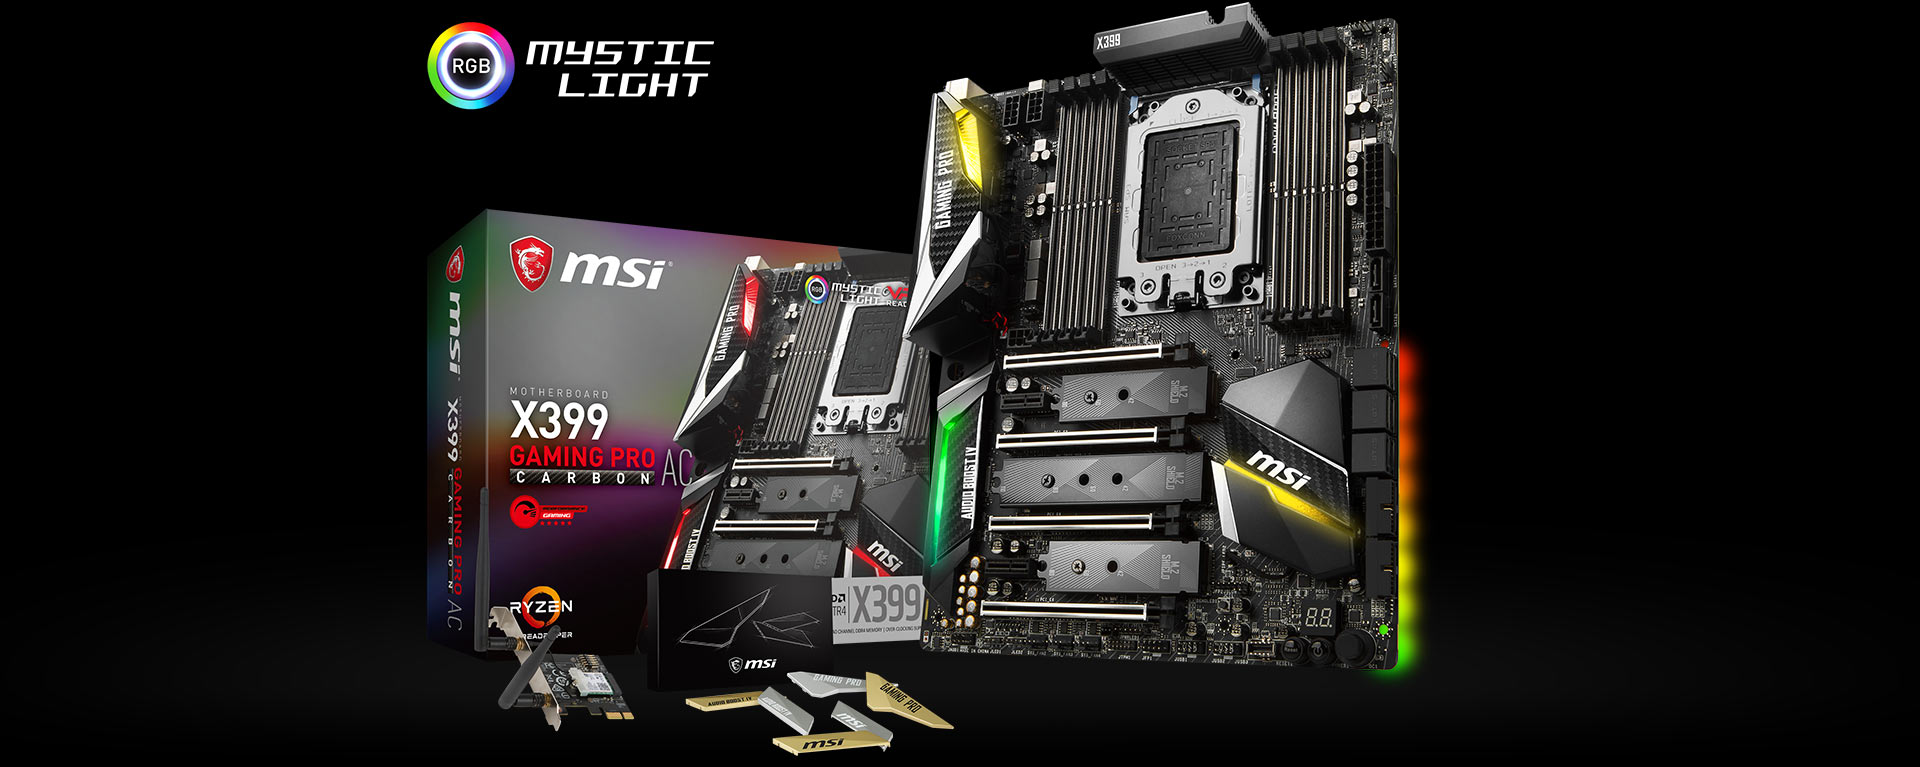 X399 Gaming Pro Carbon AC